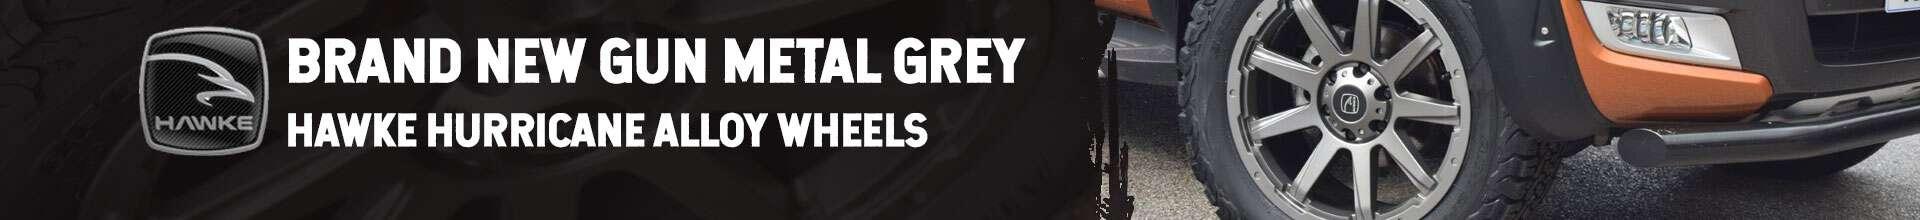 New Gun Metal Grey Alloy Wheels